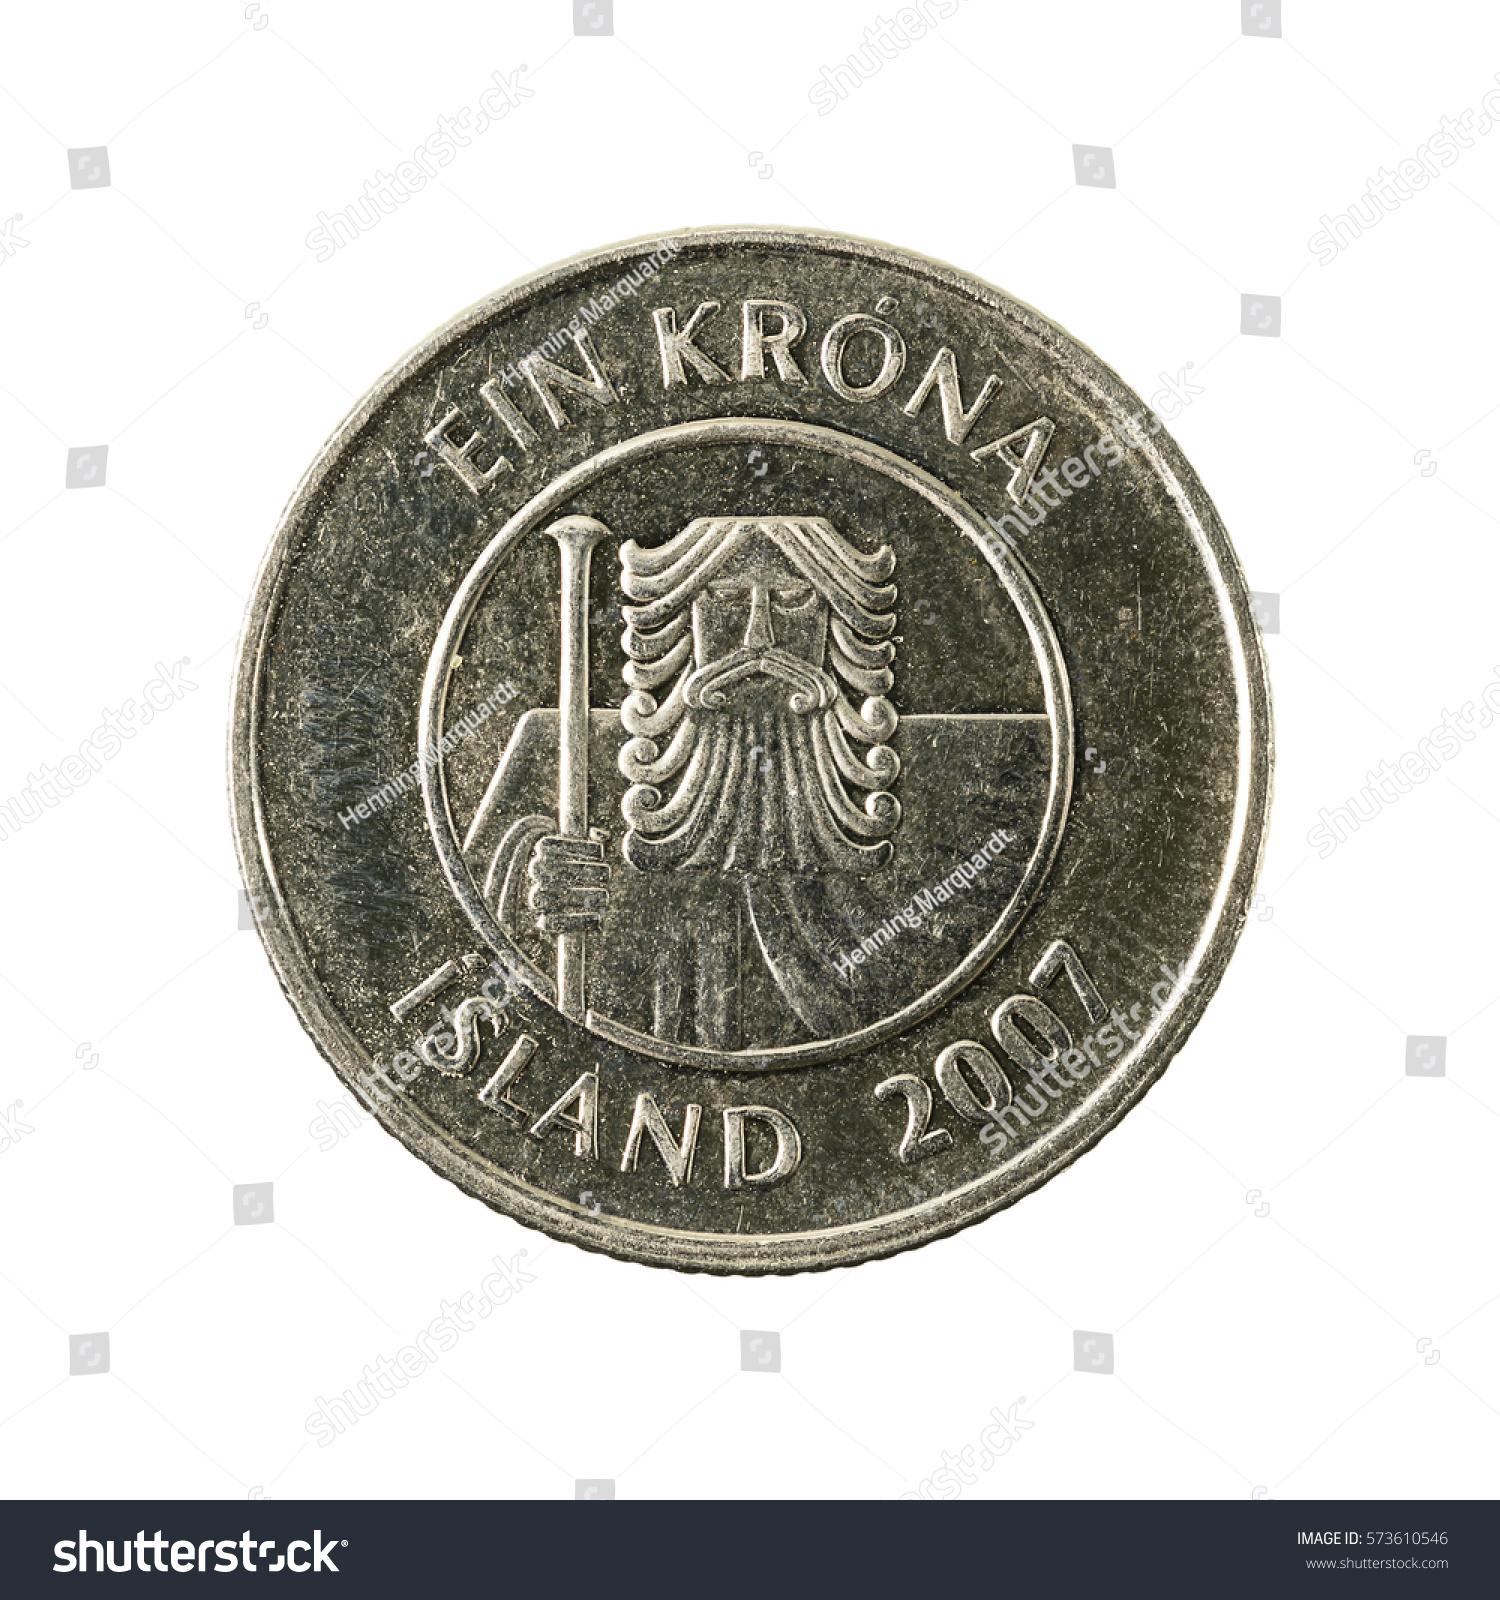 1 Icelandic Krona Coin 2007 Reverse Stock Photo Edit Now 573610546